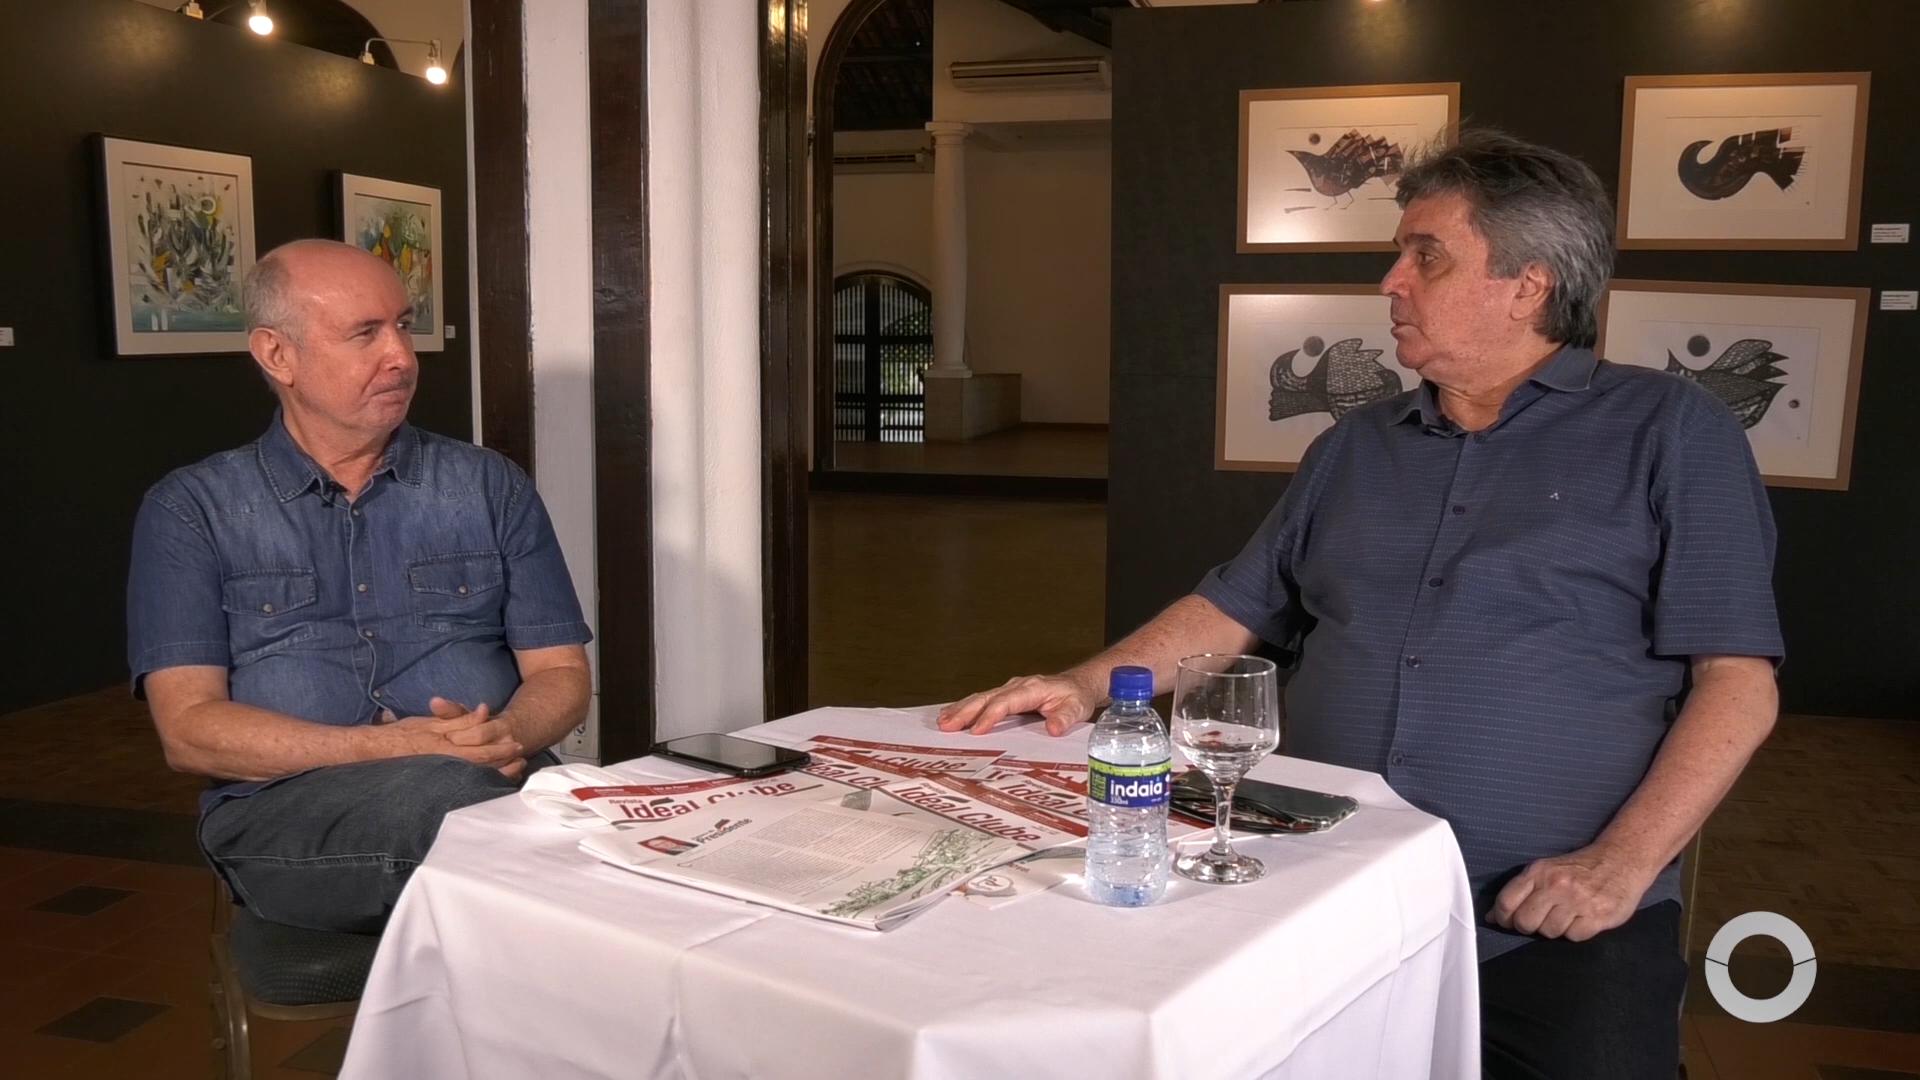 Mosaico entrevista Pres. do Ideal Club Amarílio Cavalcante